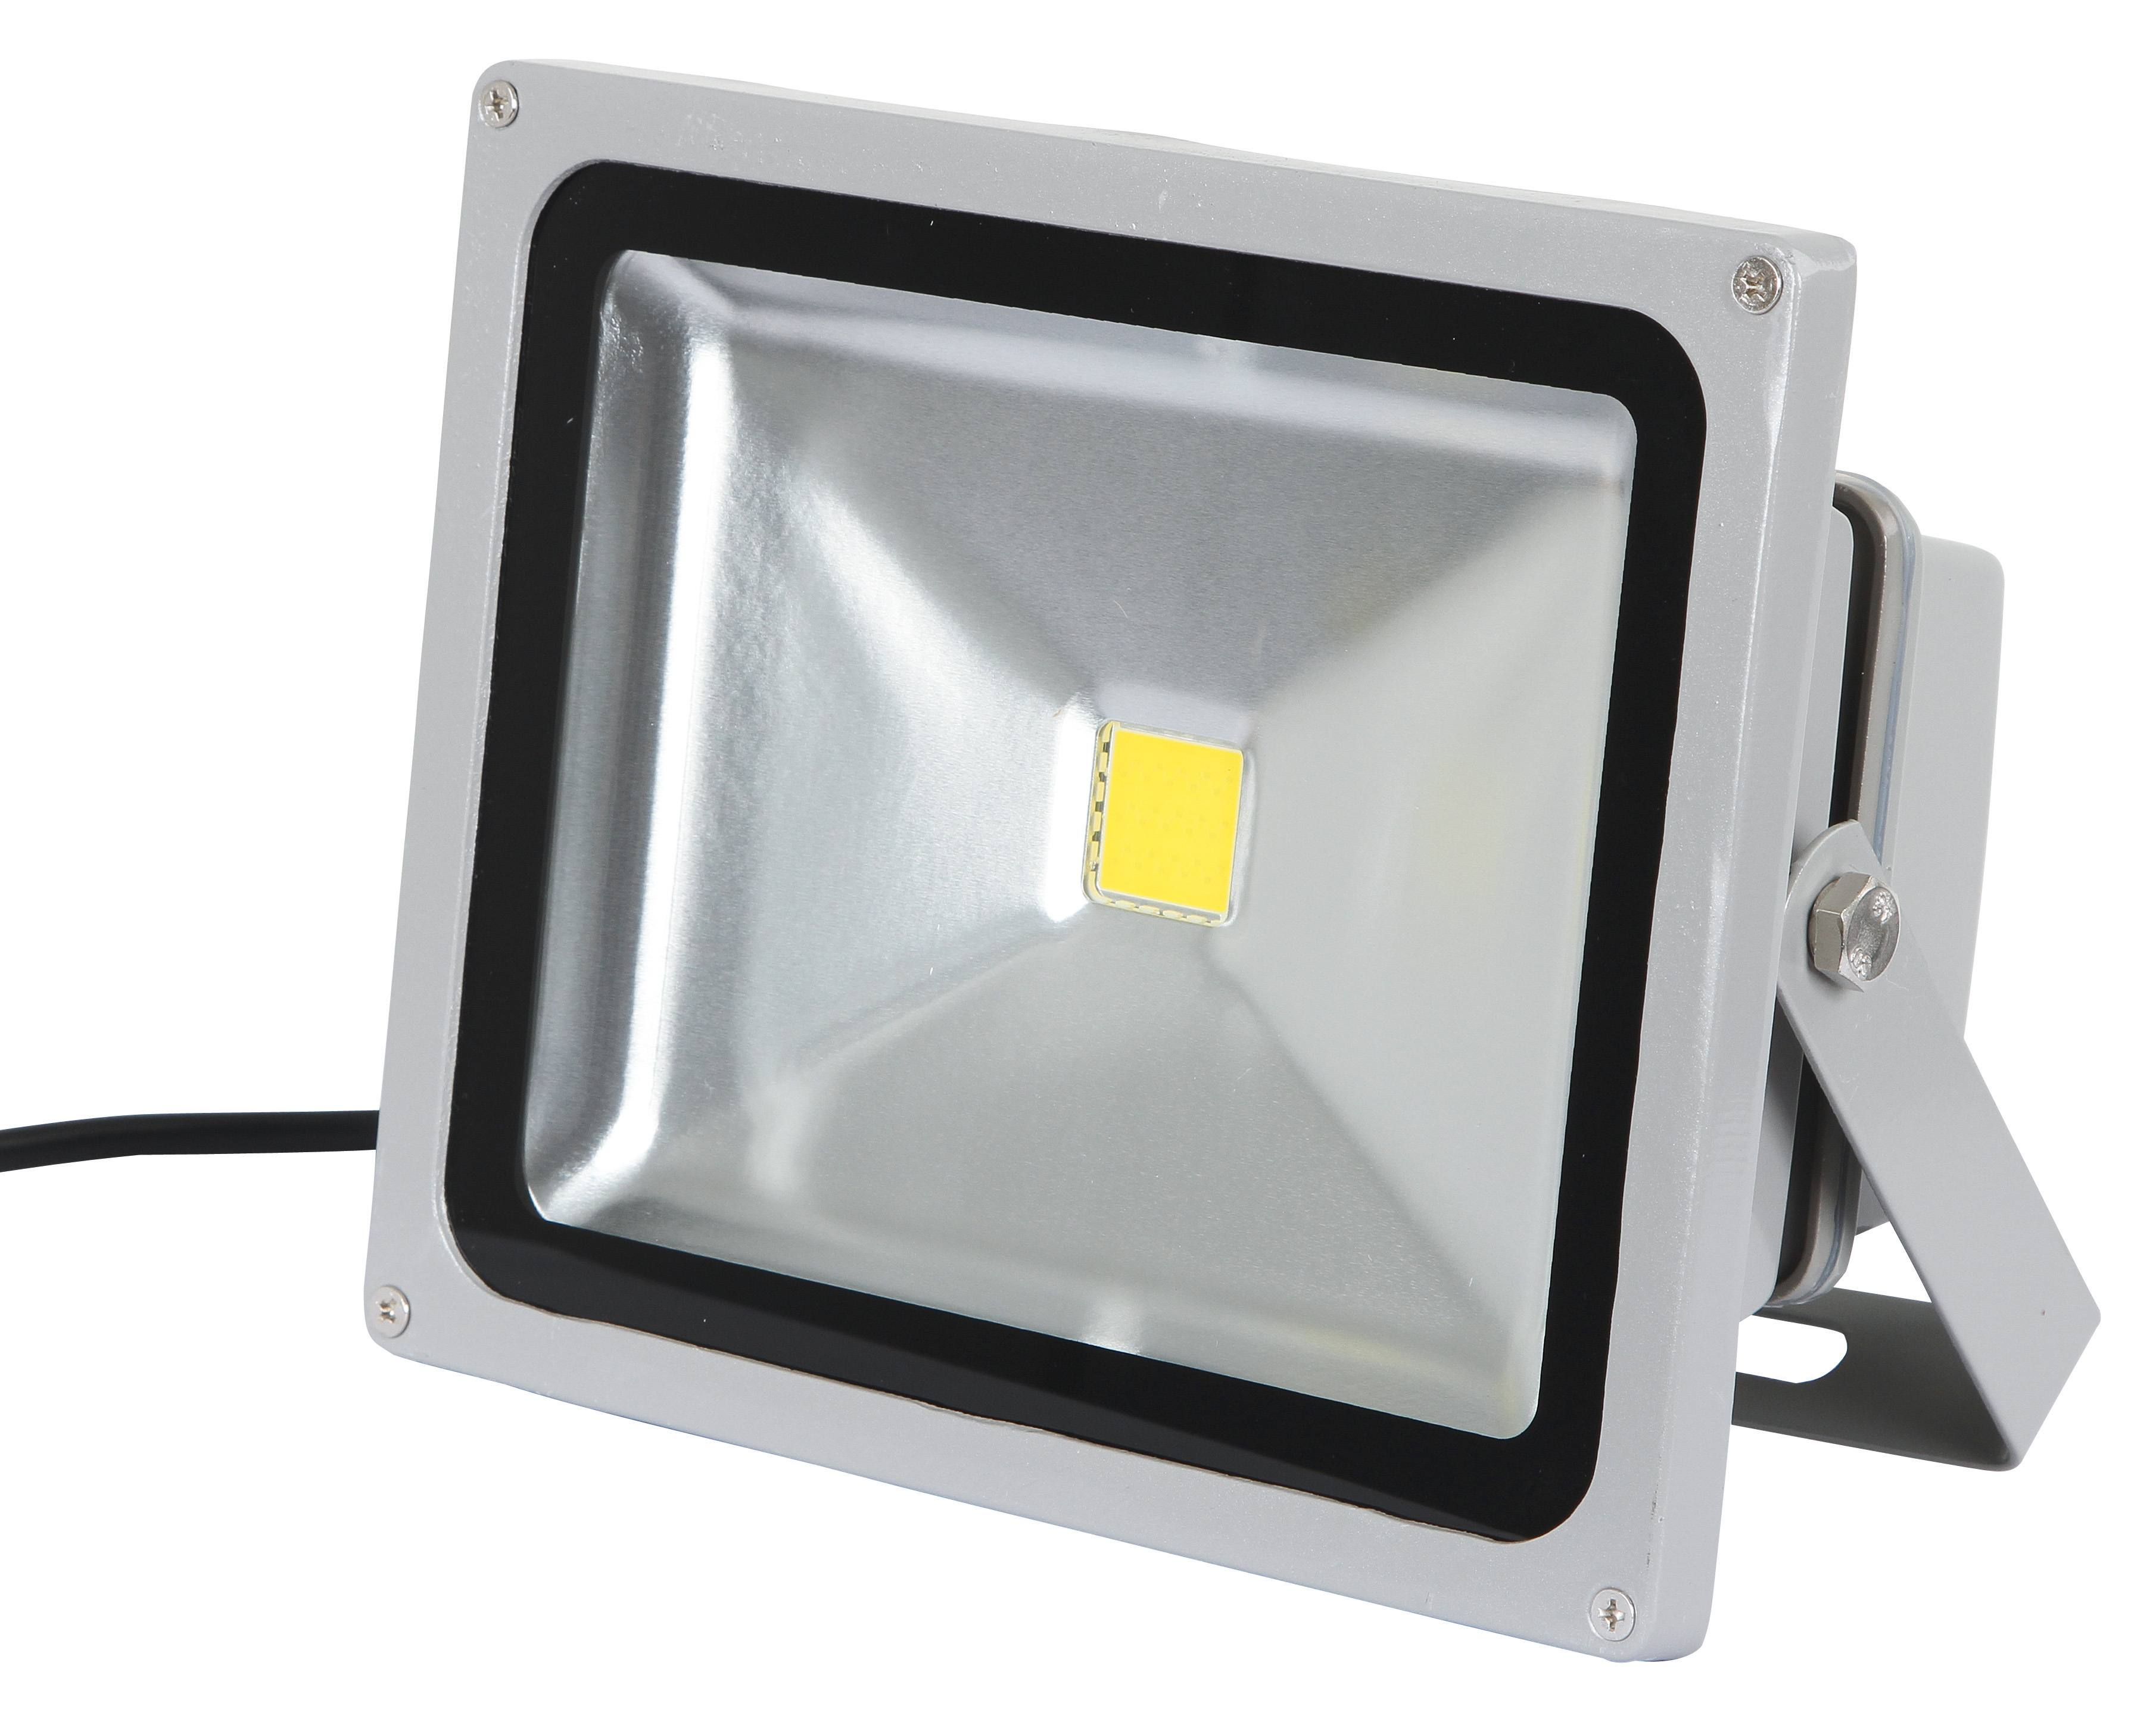 34589 Wunderschöne Led Lampen 100 Watt Dekorationen